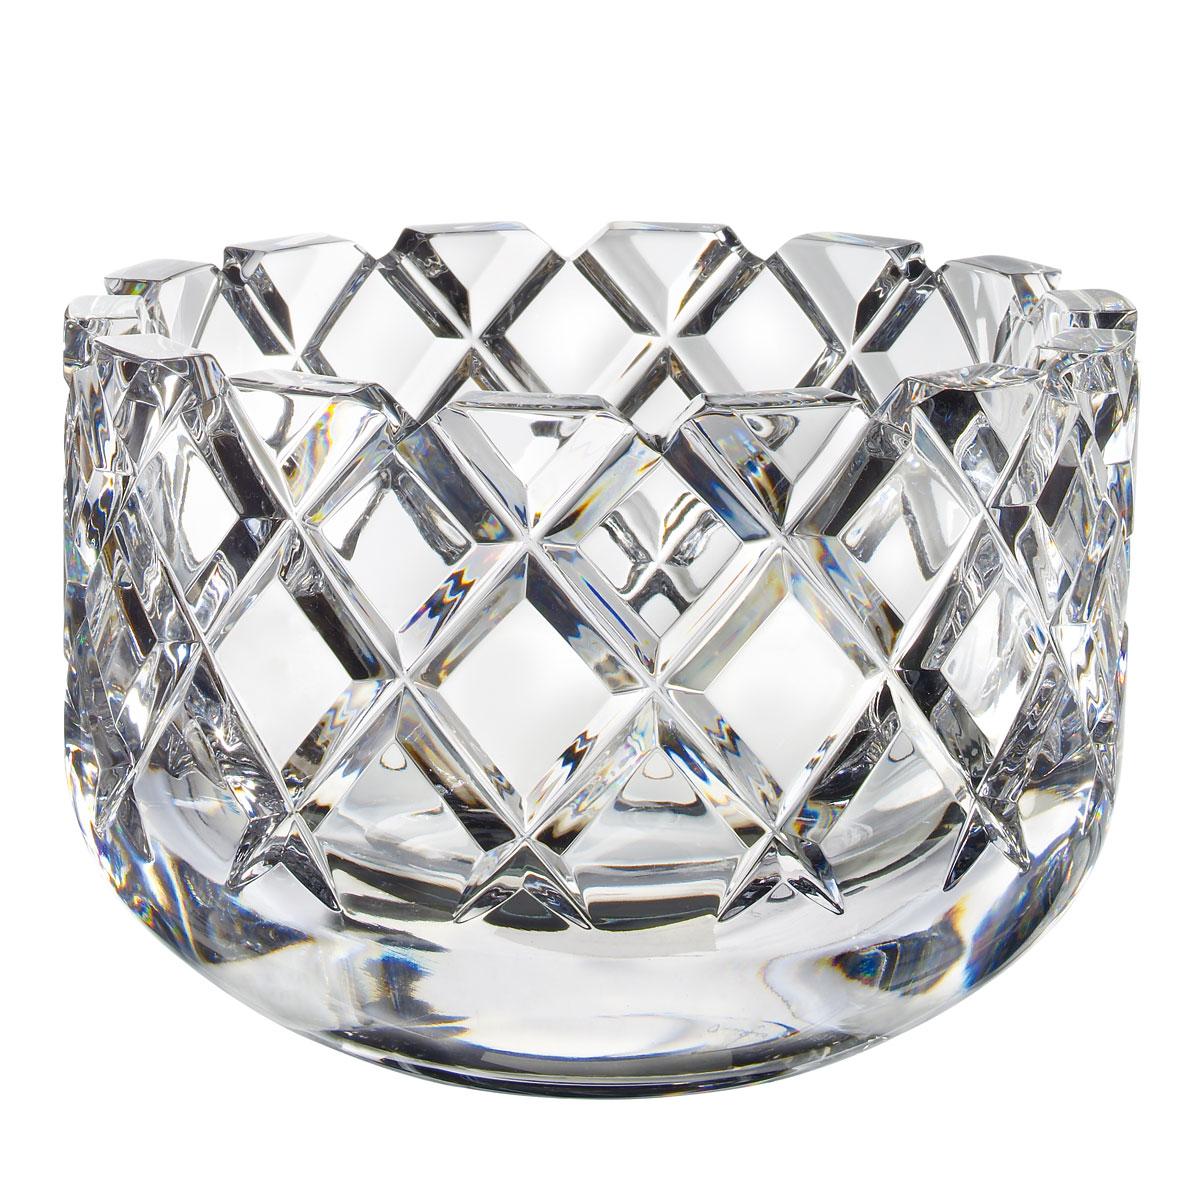 Orrefors Crystal, Classic Sofiero Large Crystal Bowl